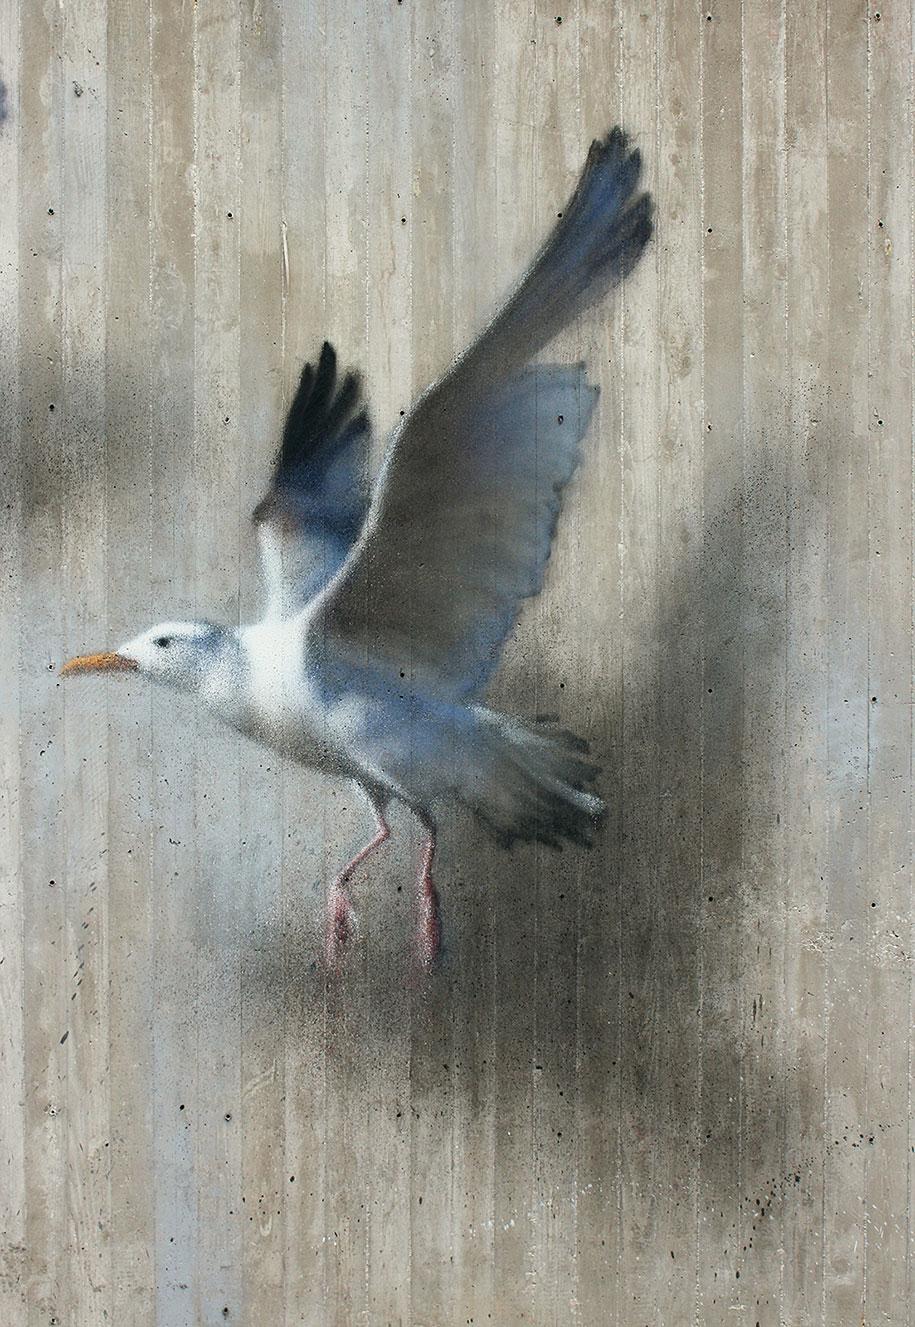 roadside-street-art-bird-mural-eron-riccione-5